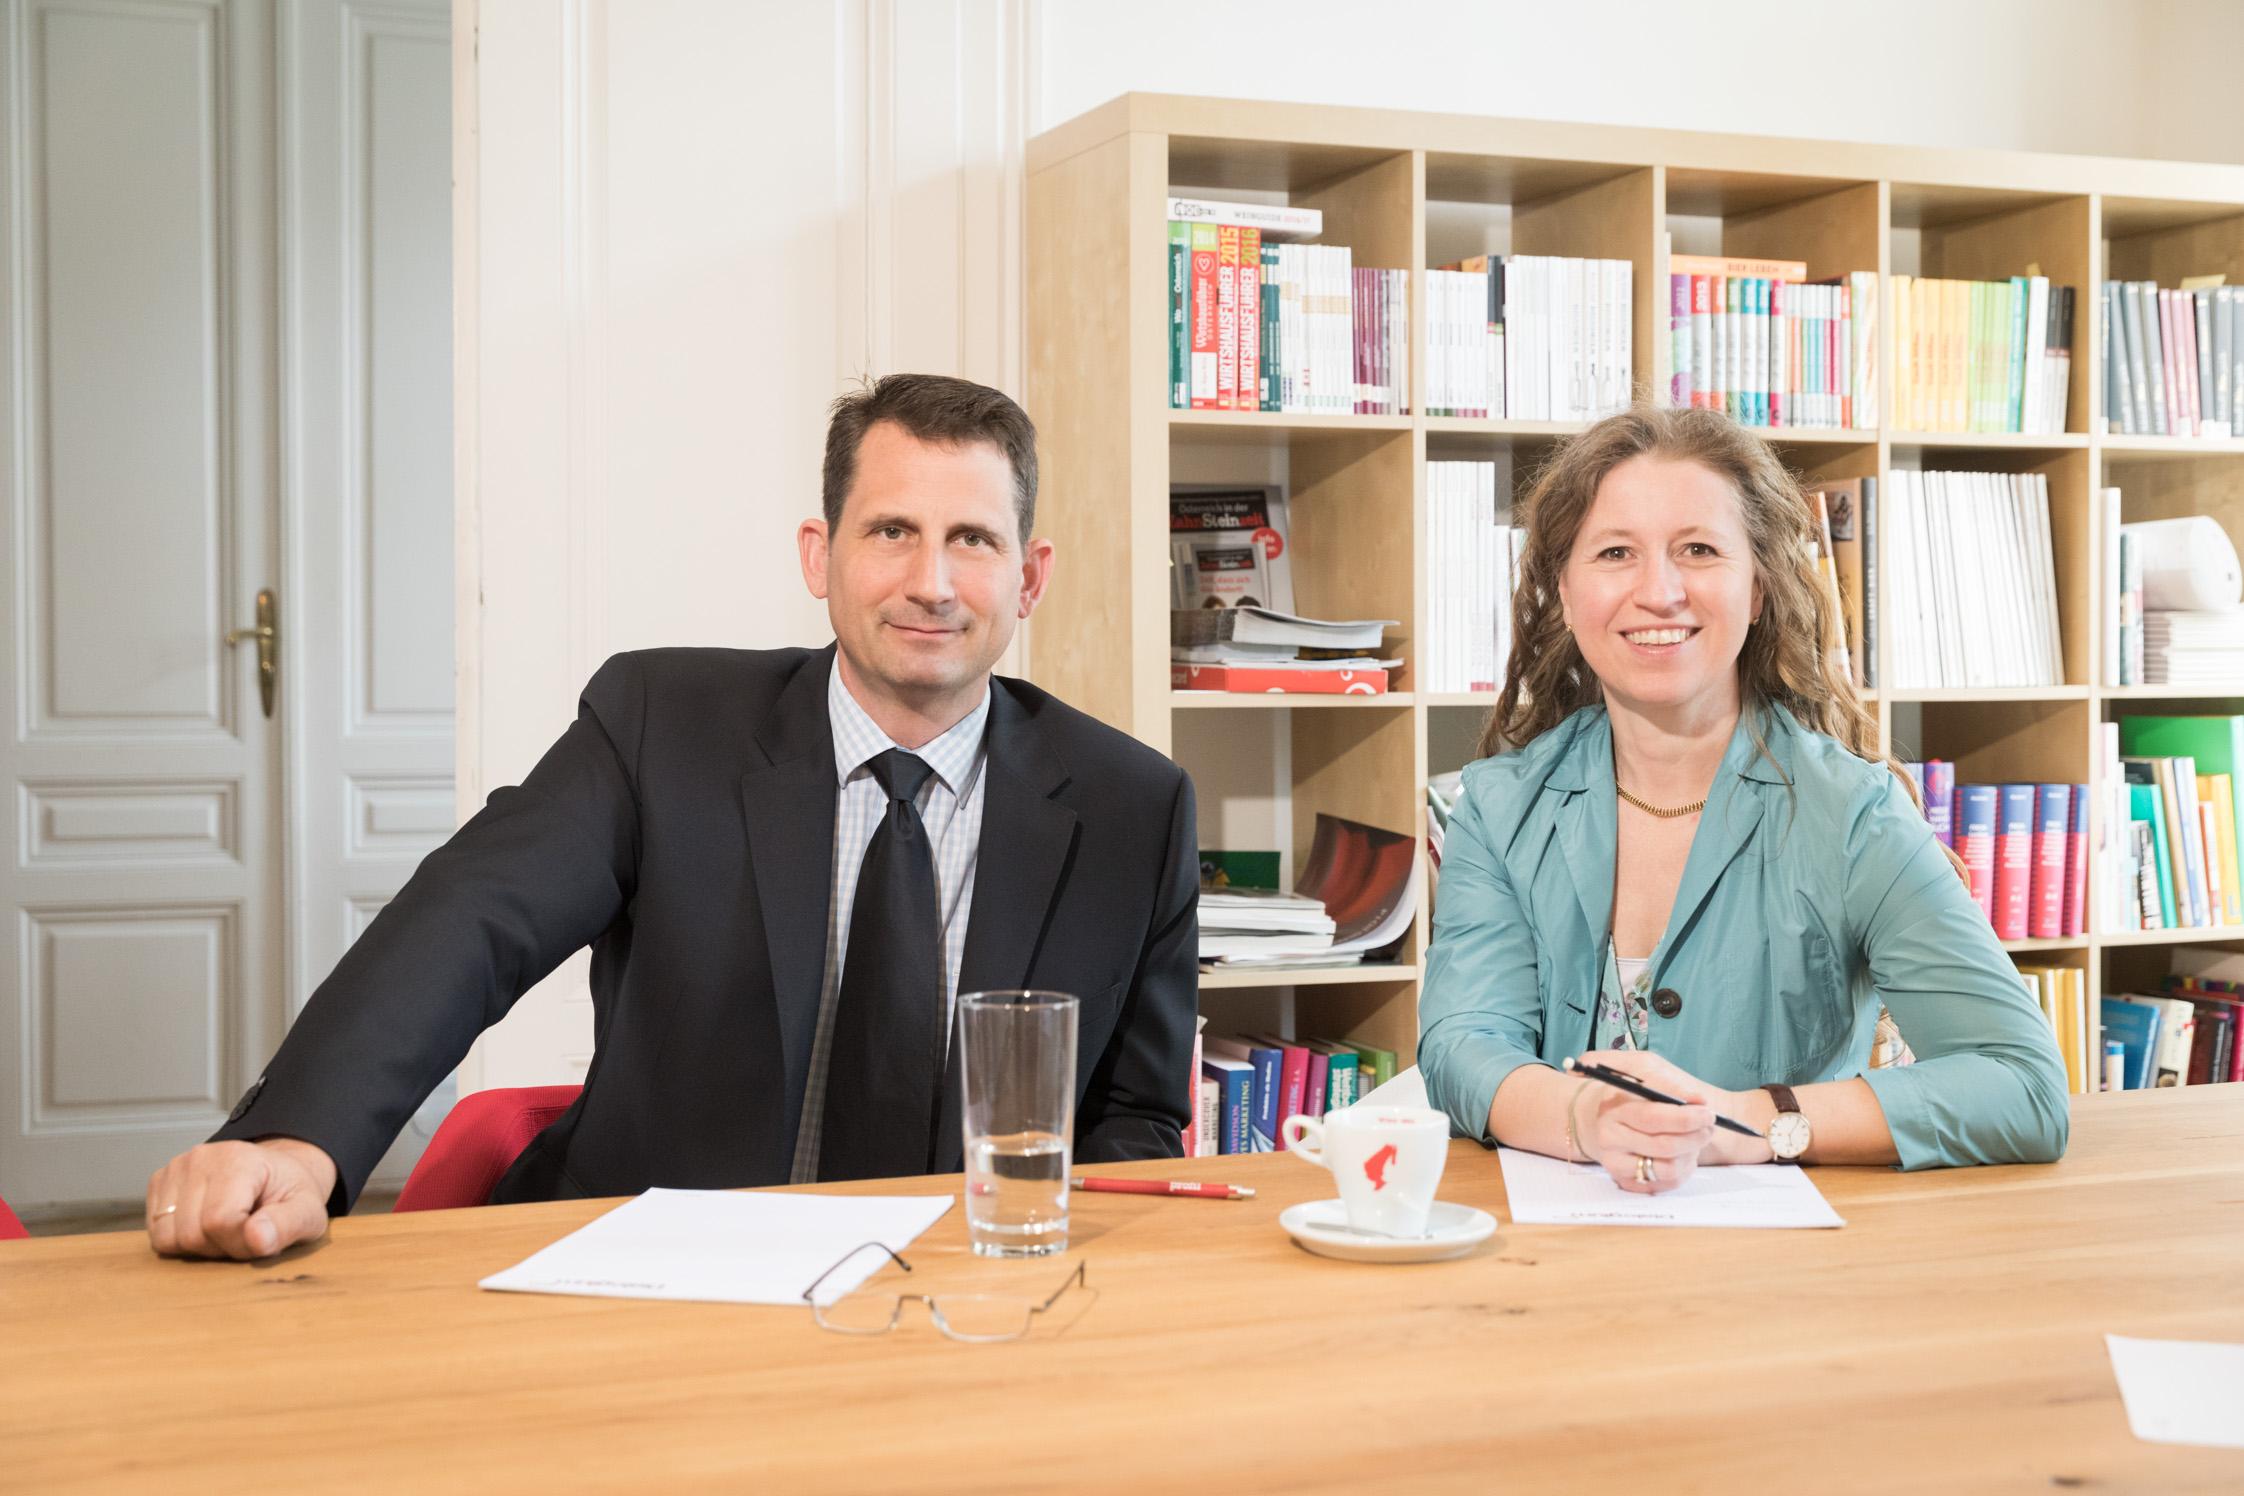 Caroline Krall & Clemens Swatonek